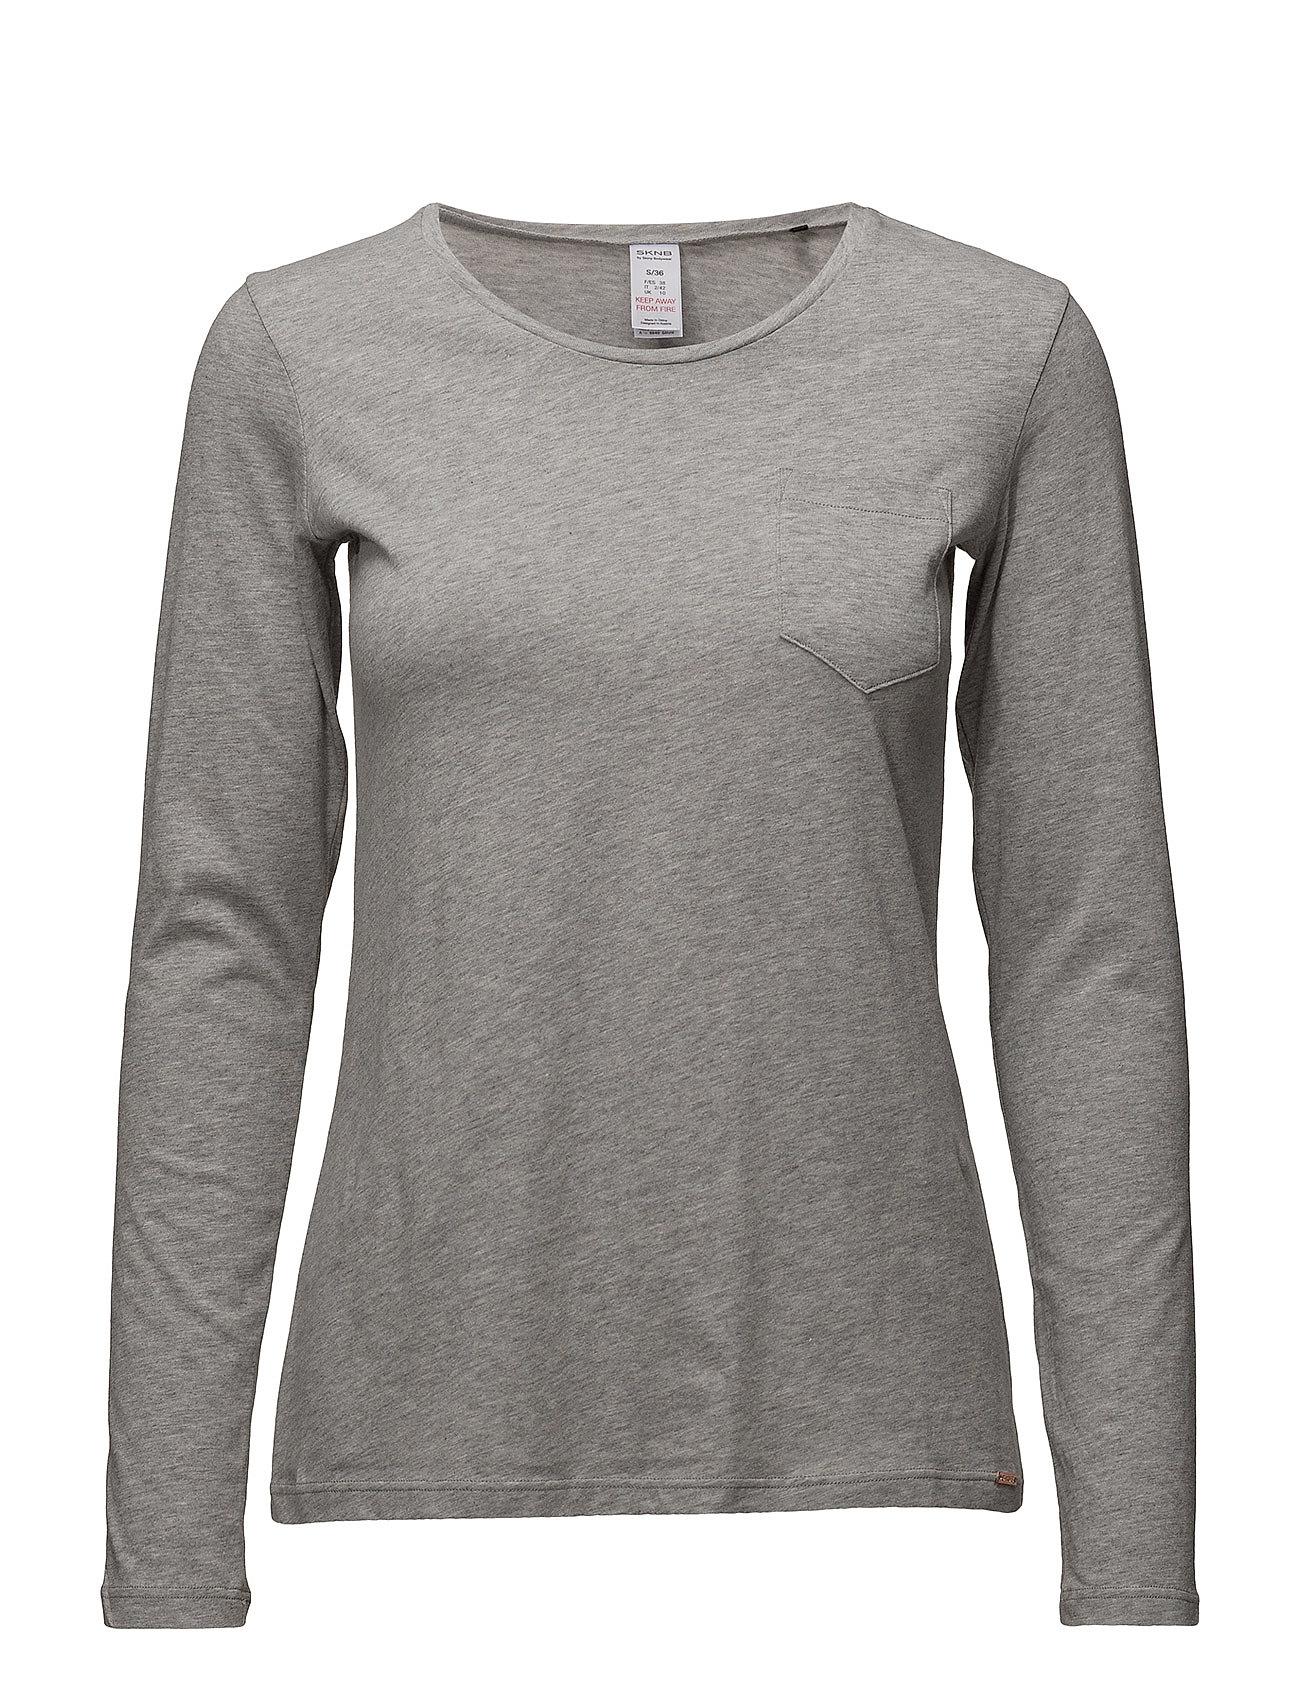 Skiny L. shirt l/slv - PEPPLE GREY MELANGE